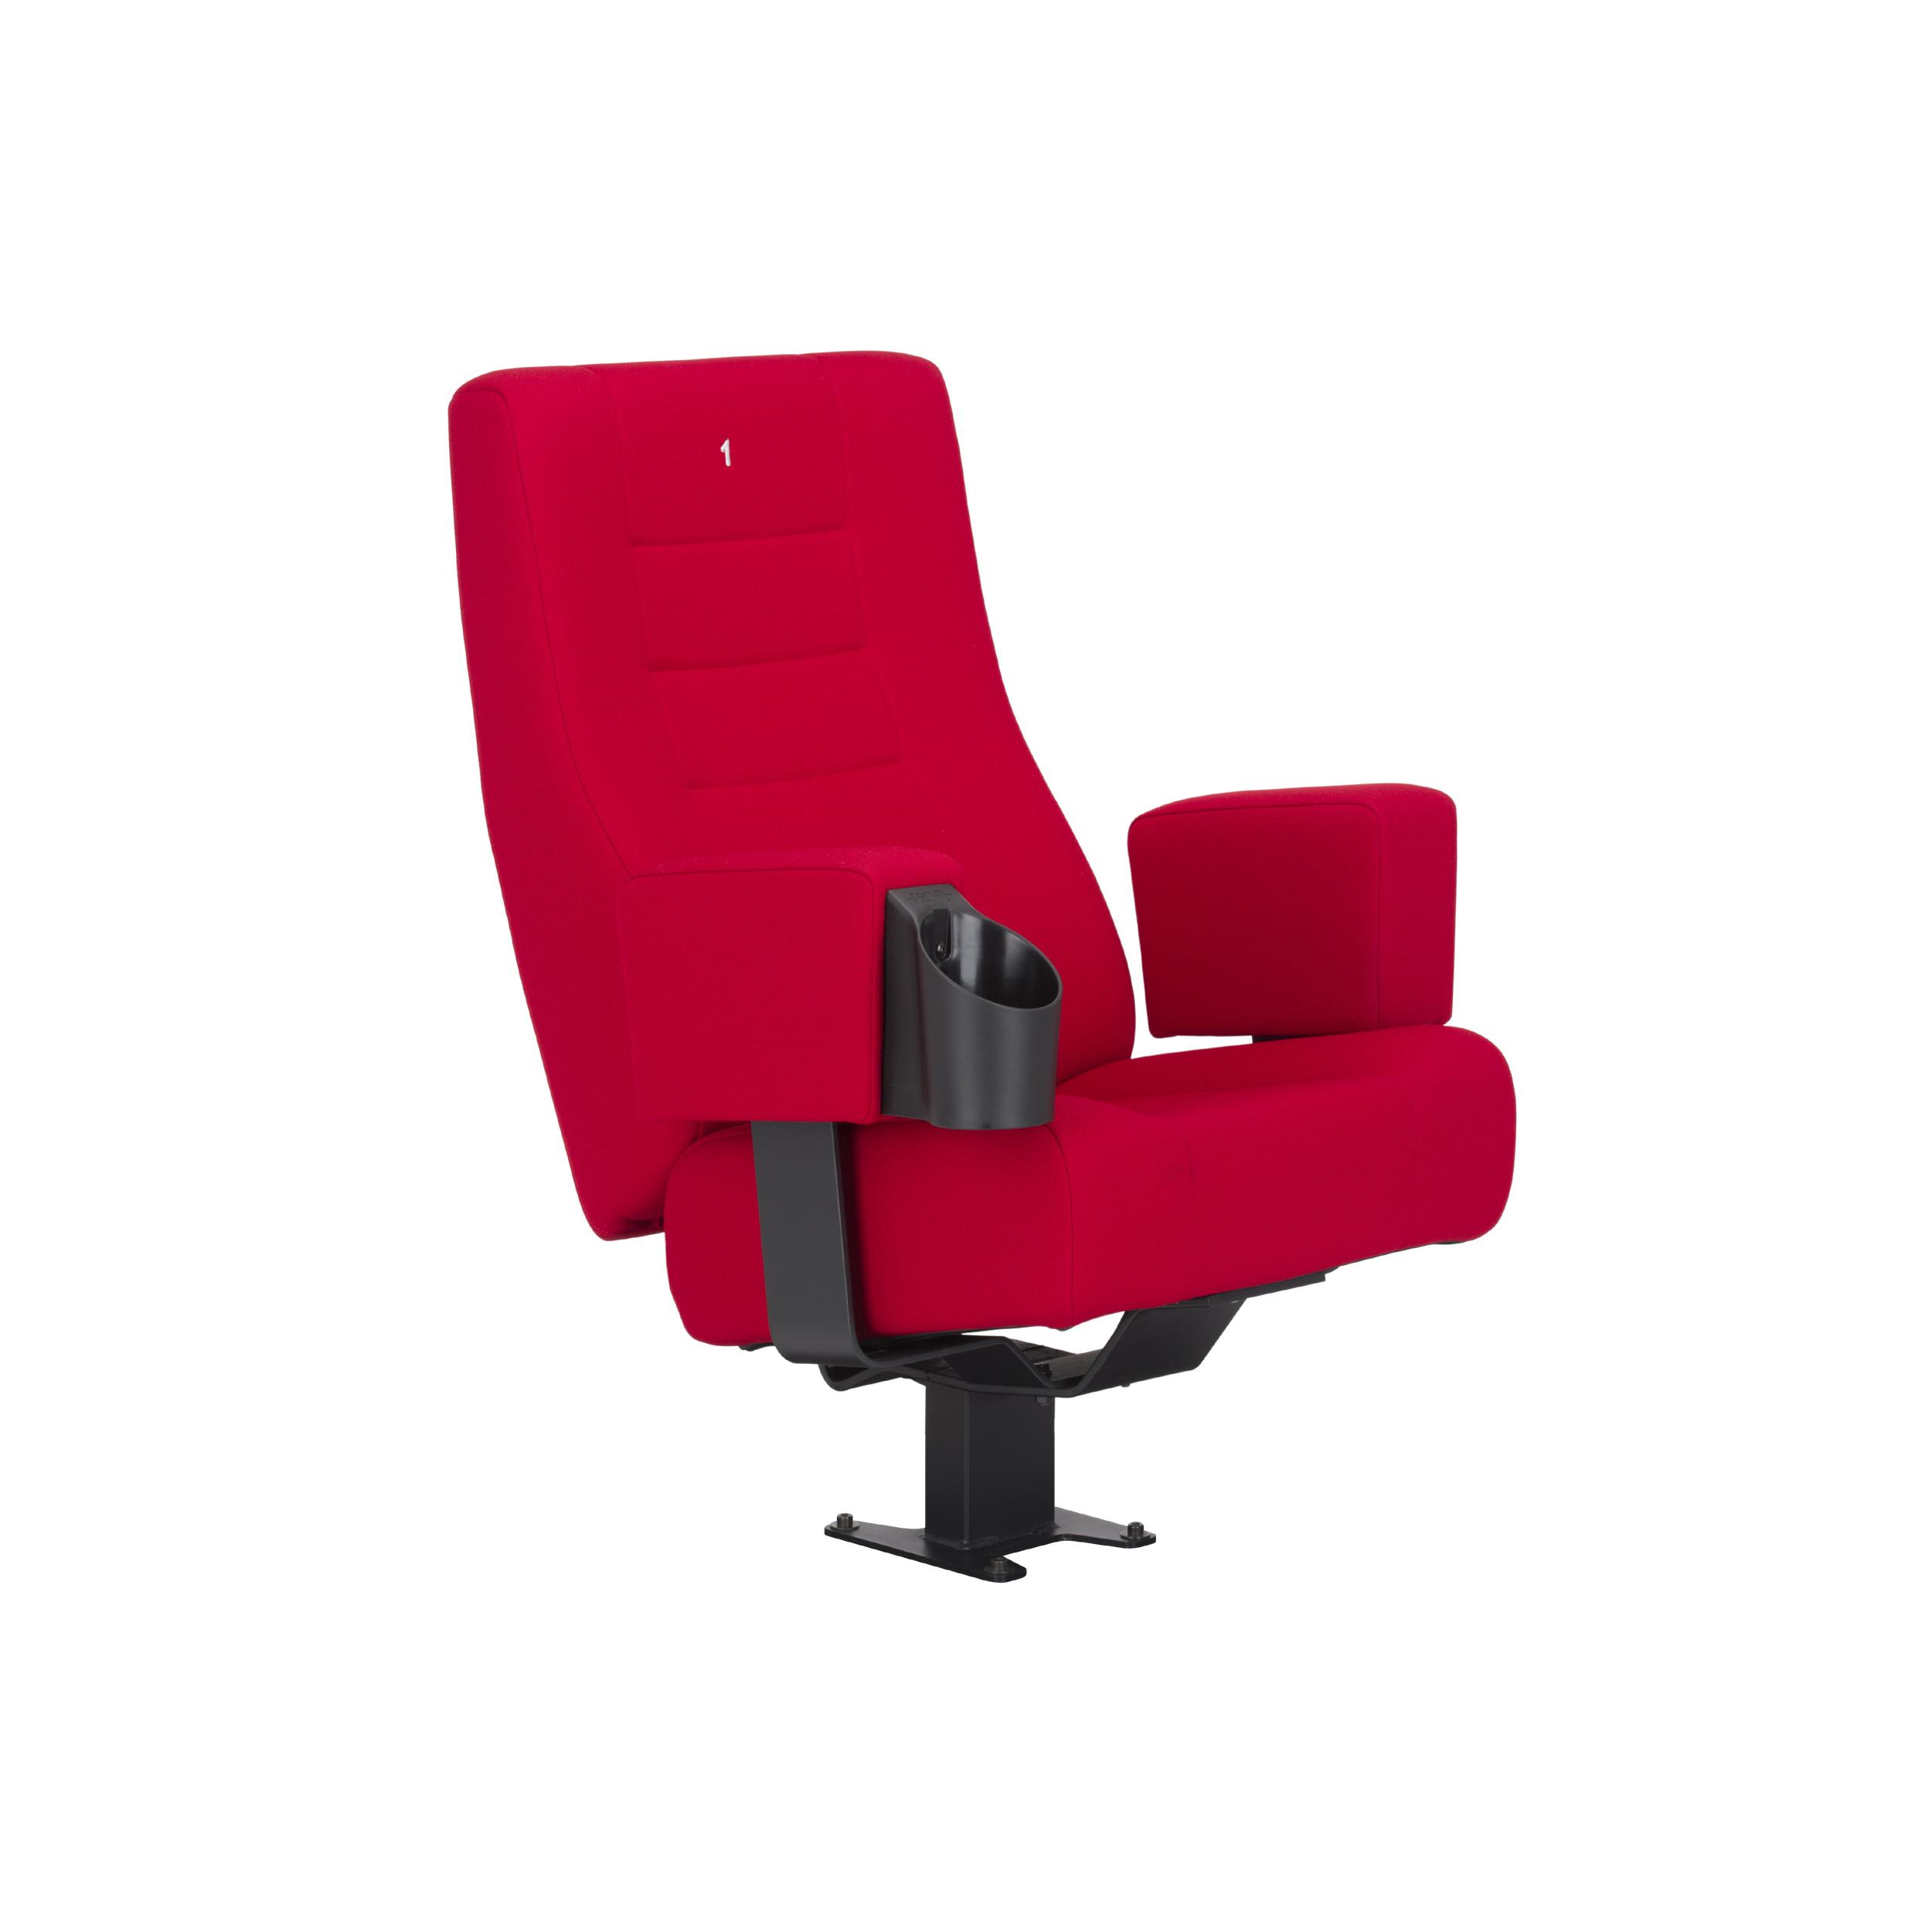 forum-seating_1-1_humprey-4.jpg